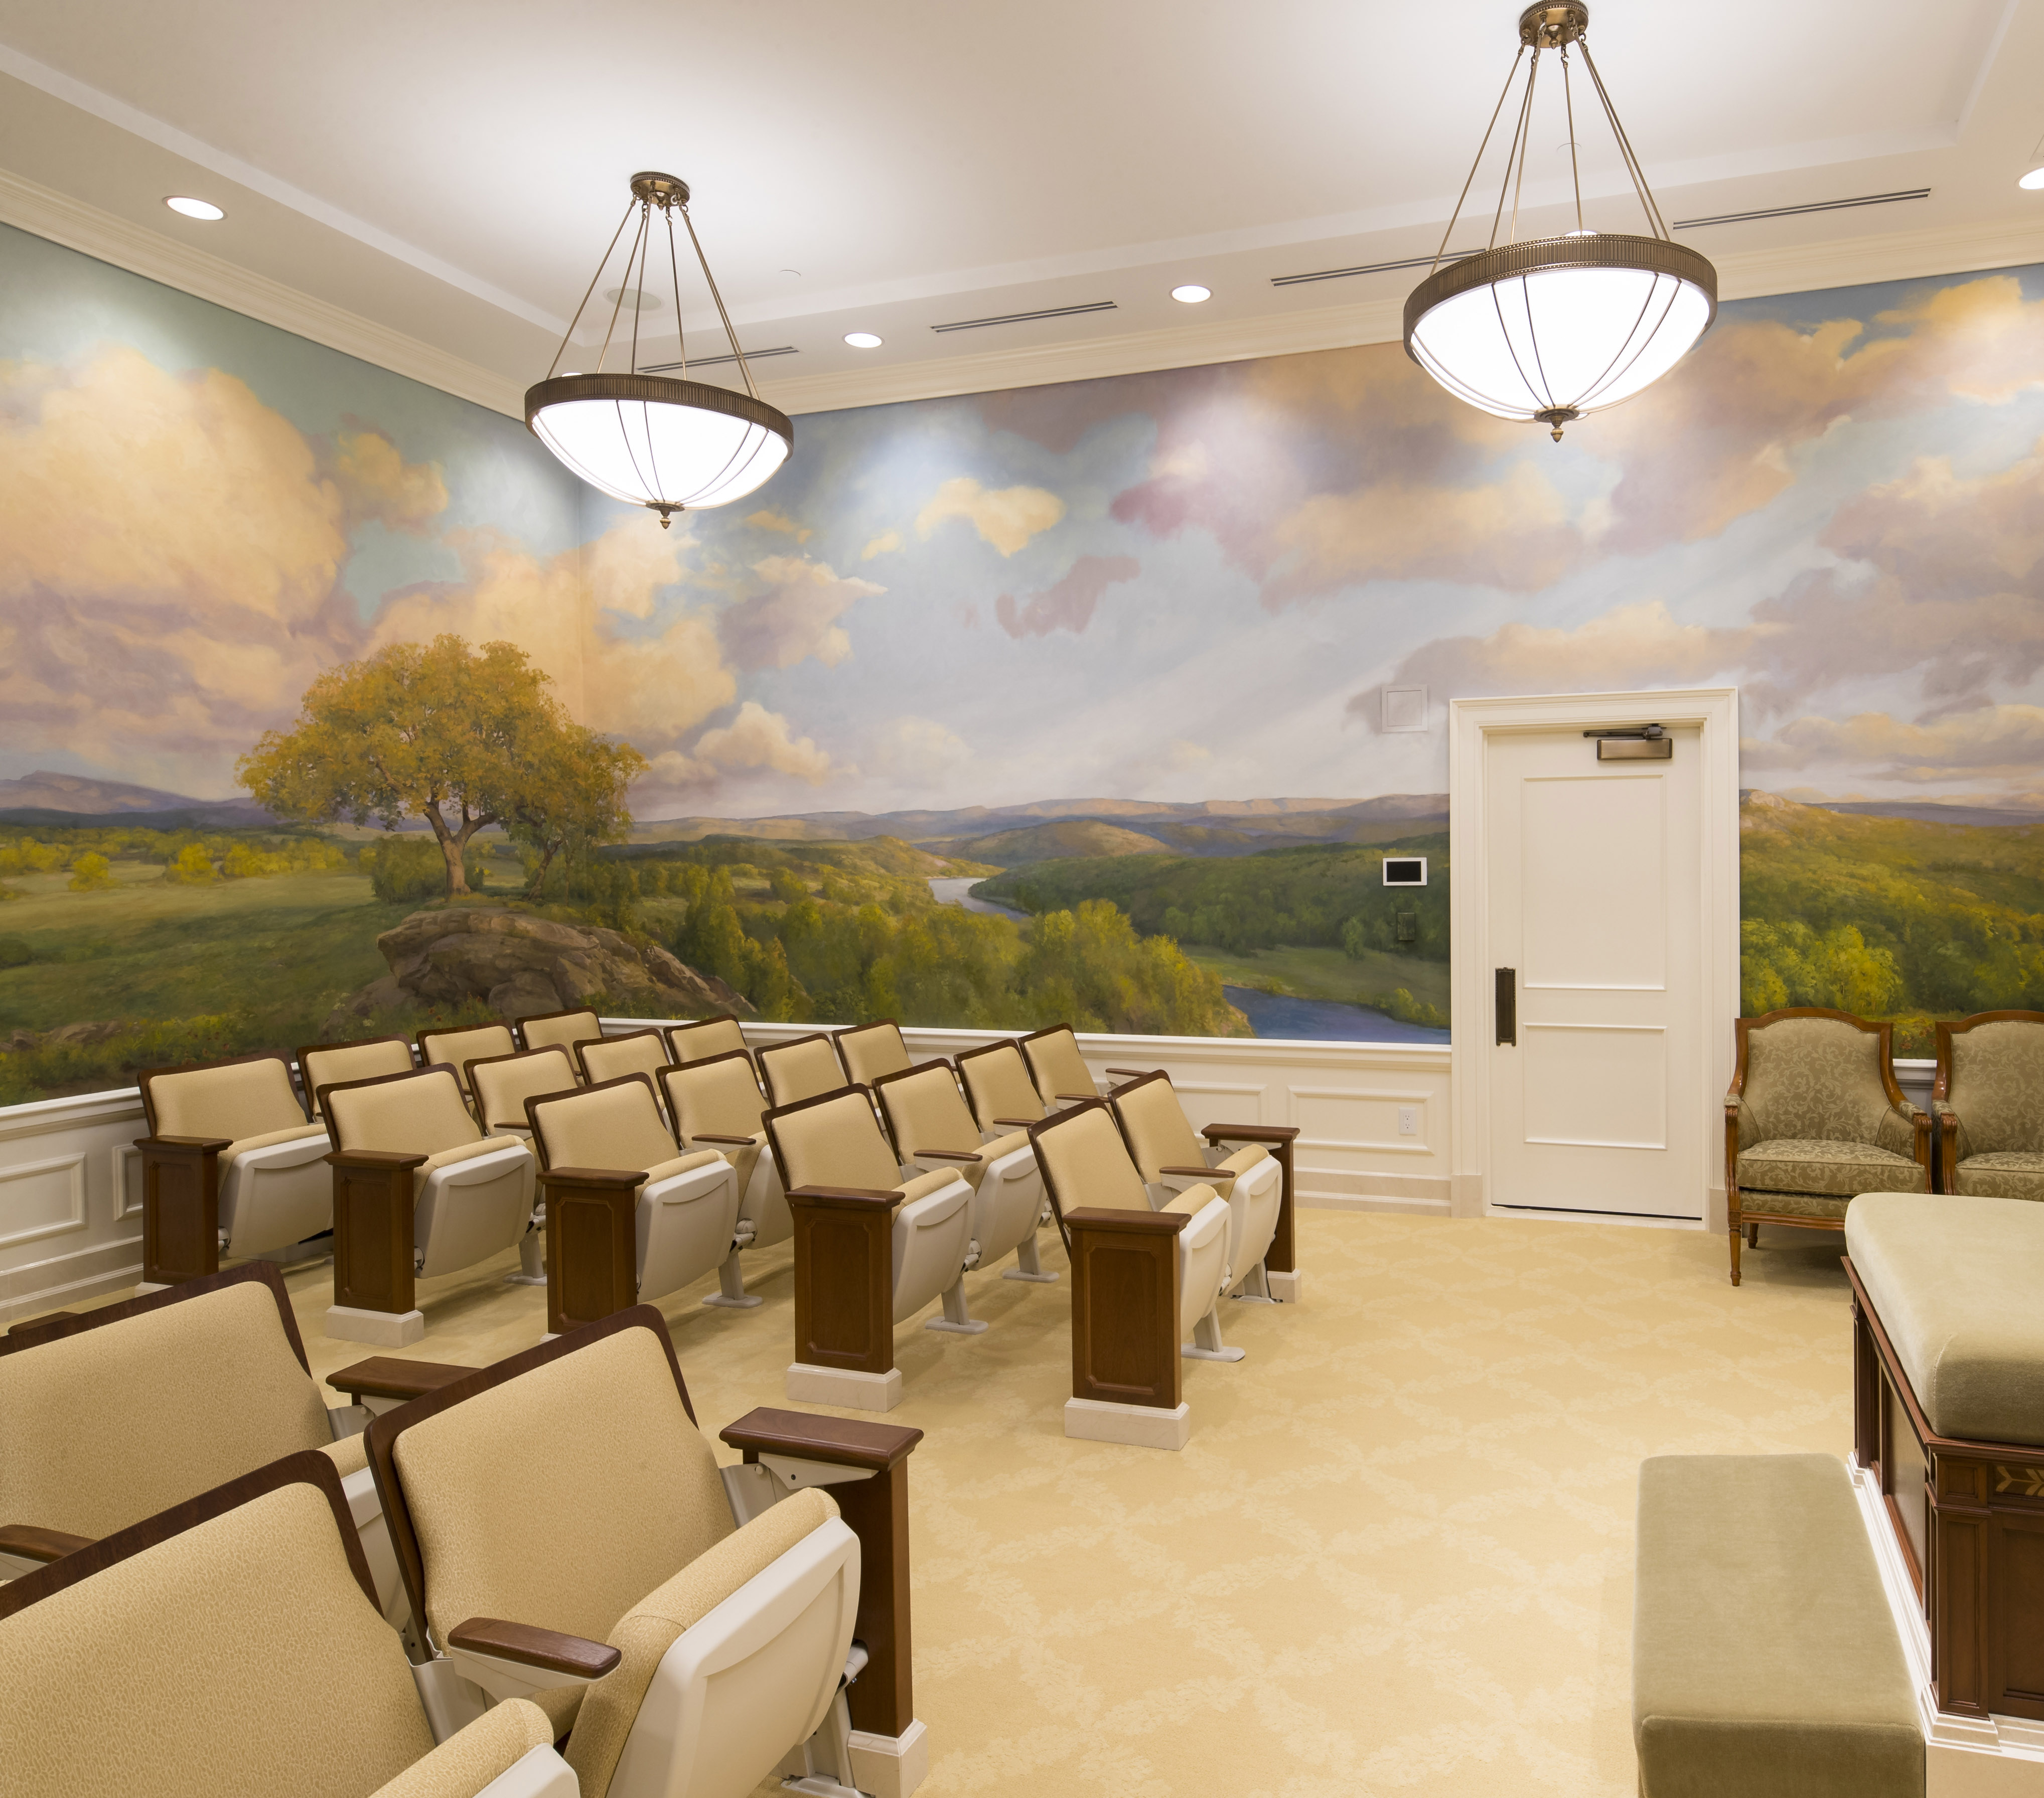 An instruction room in the Oklahoma City Oklahoma Temple.